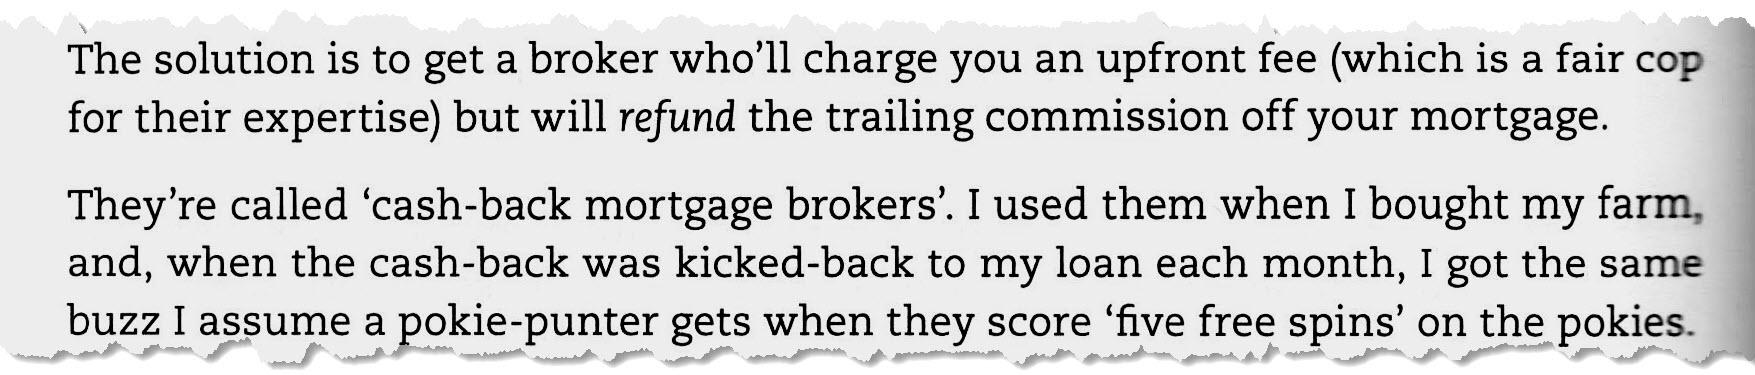 Barefoot Investor cash-back mortgage brokers snippet